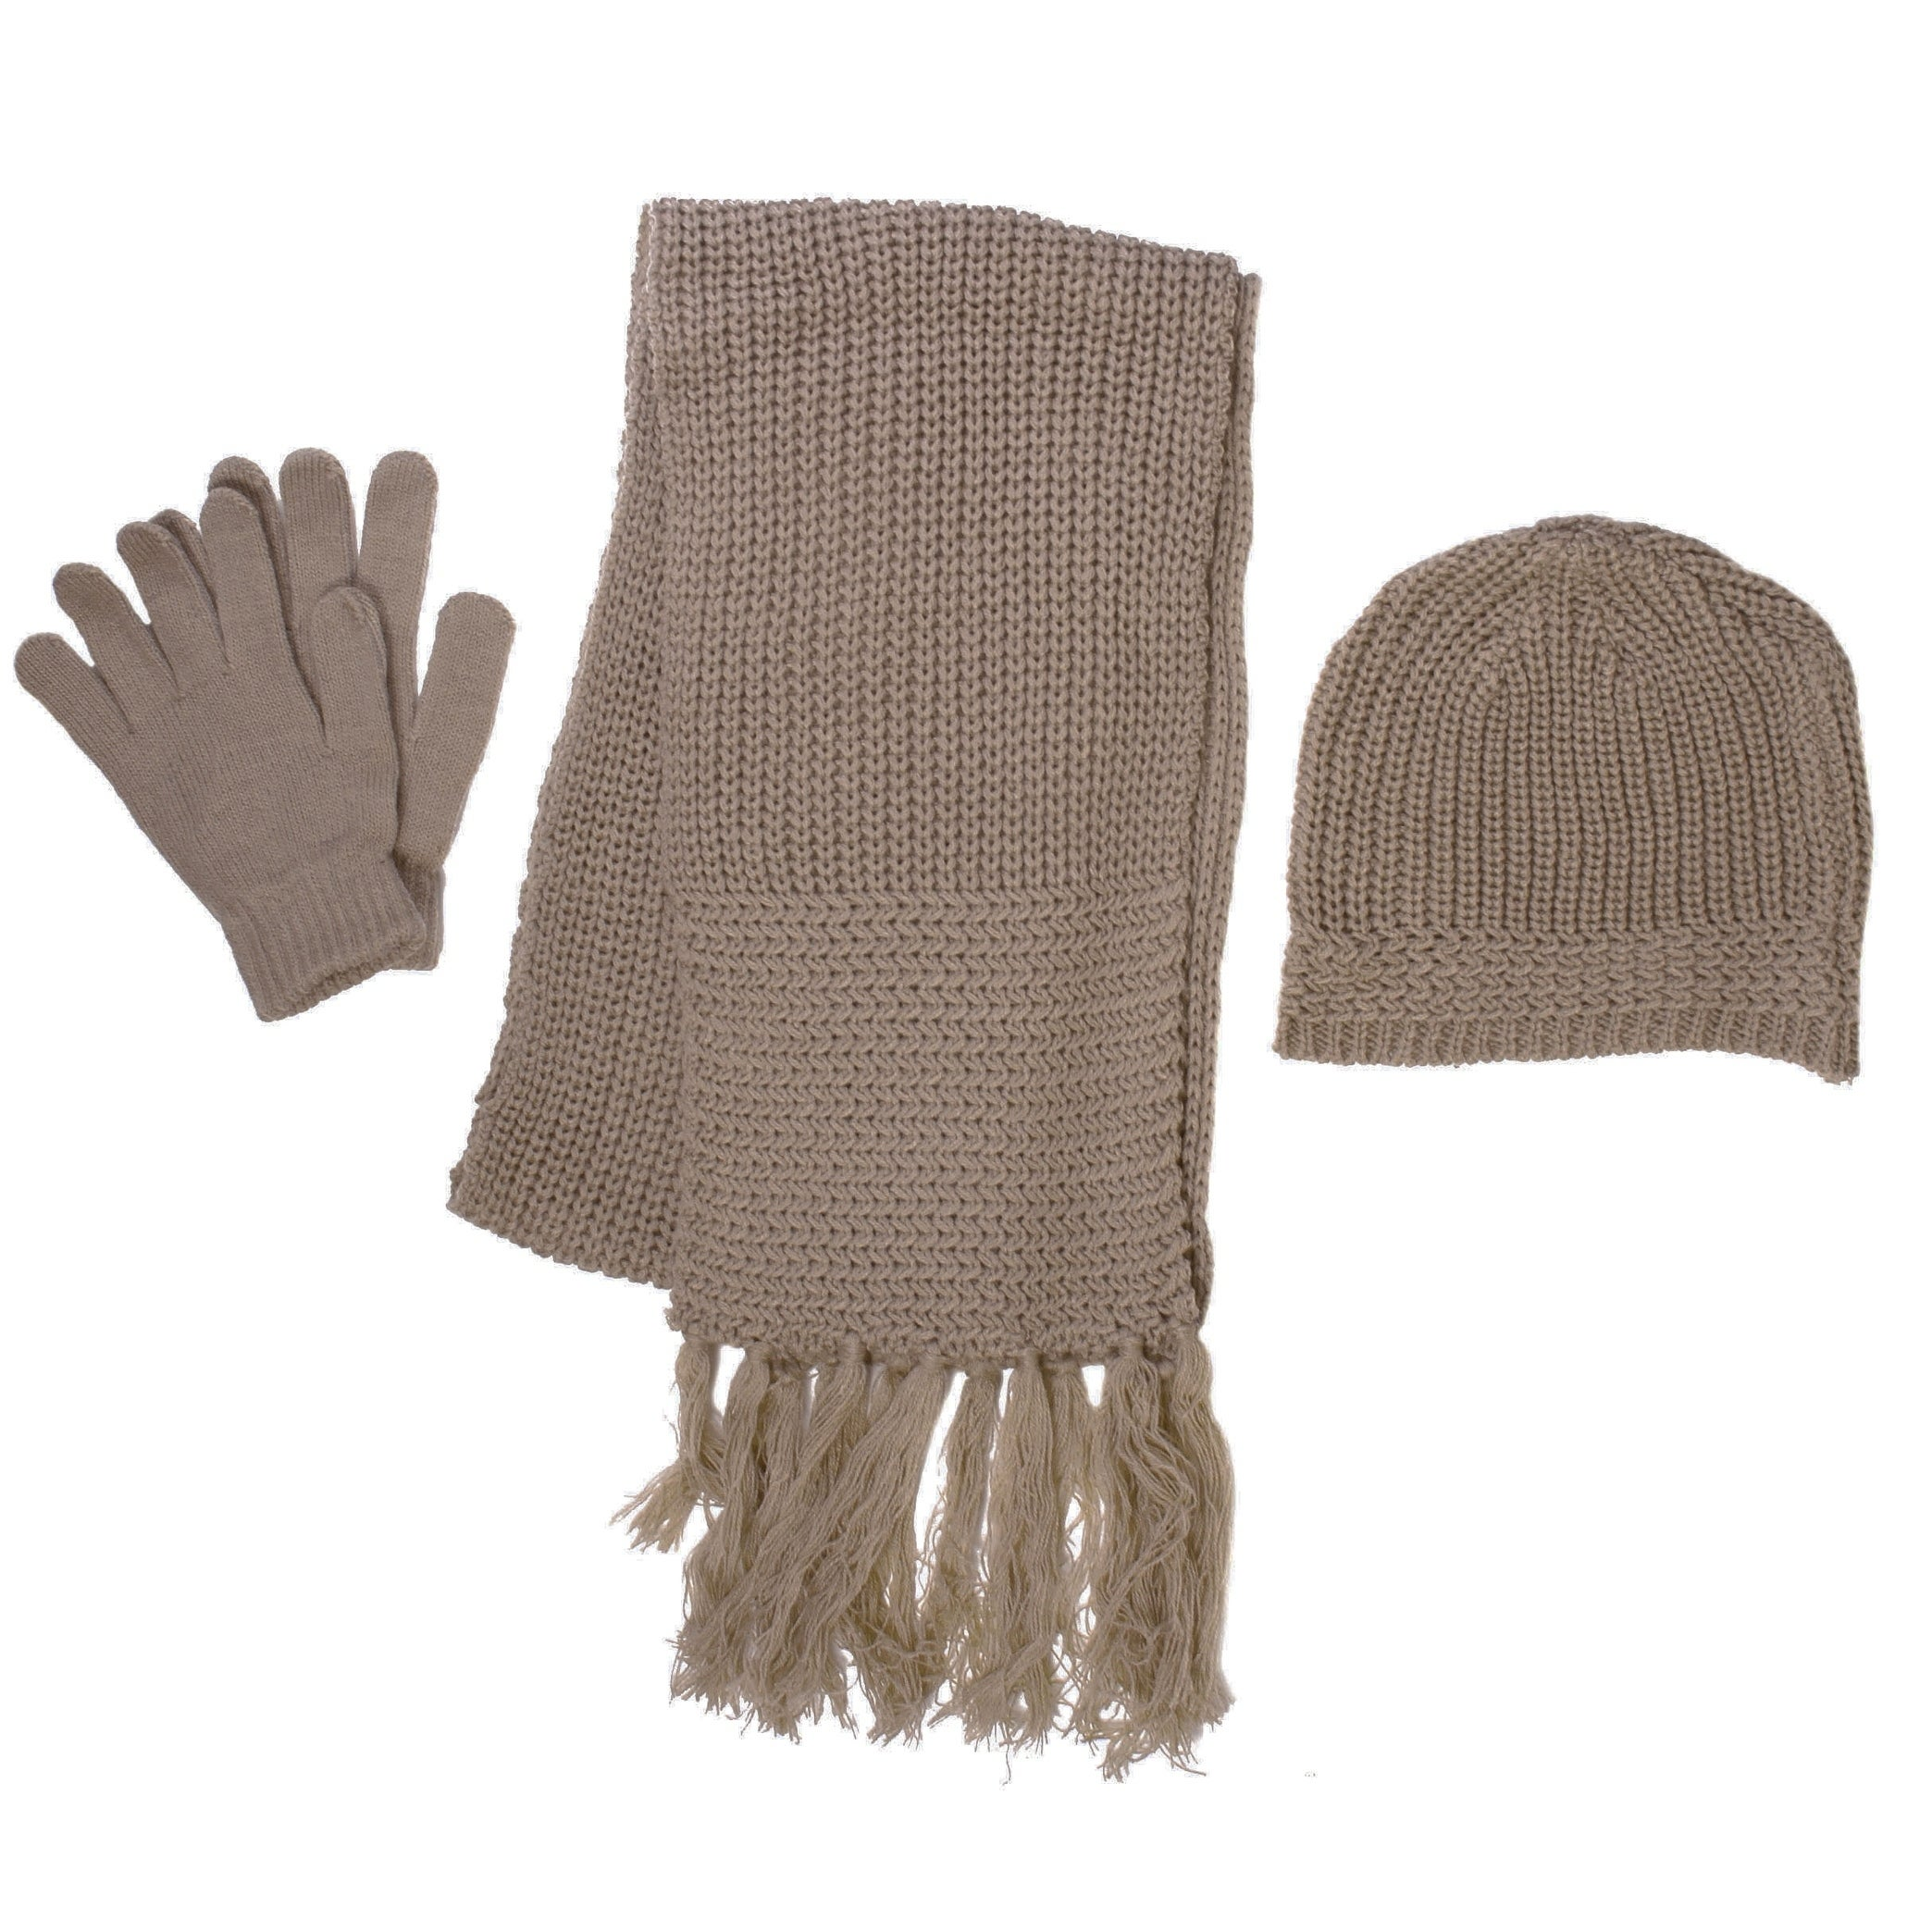 Simplicity Men Winter Knitted Warm Gloves Scarf Hat Set (...